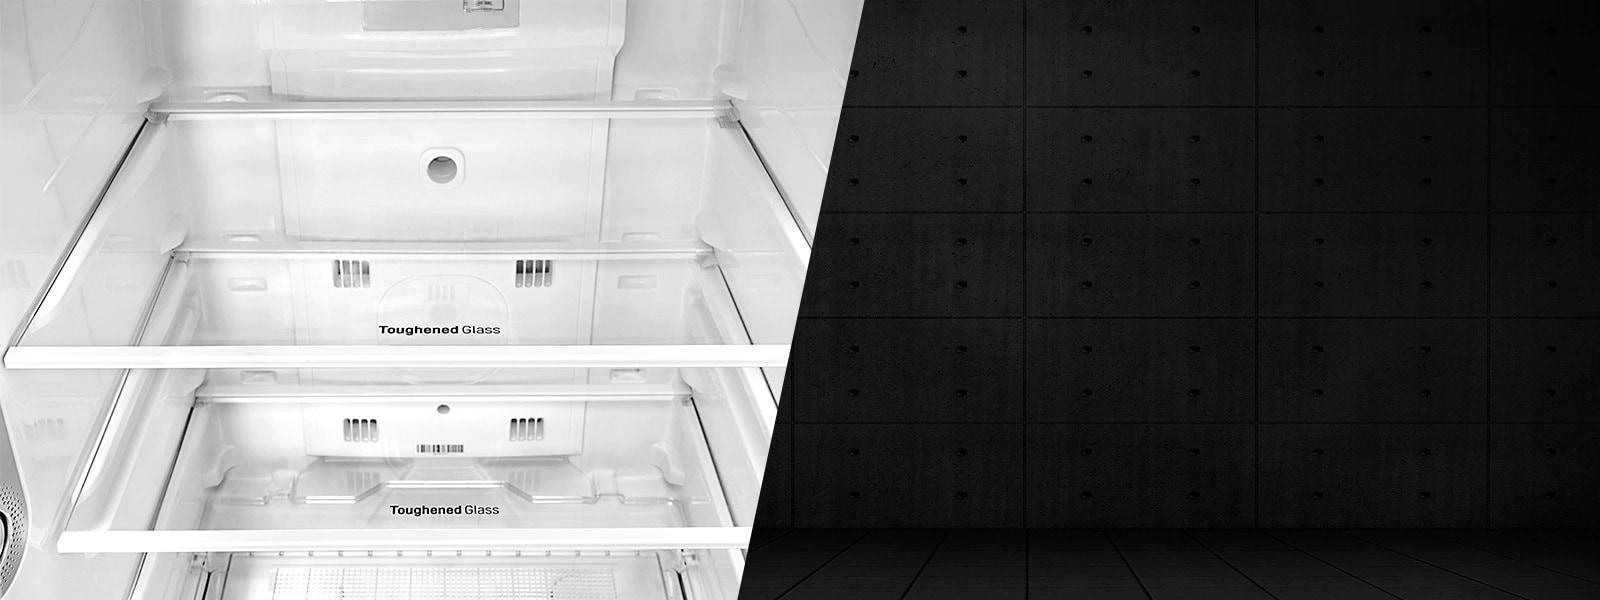 LG GL-T292RBCX Toughened Glass Shelves